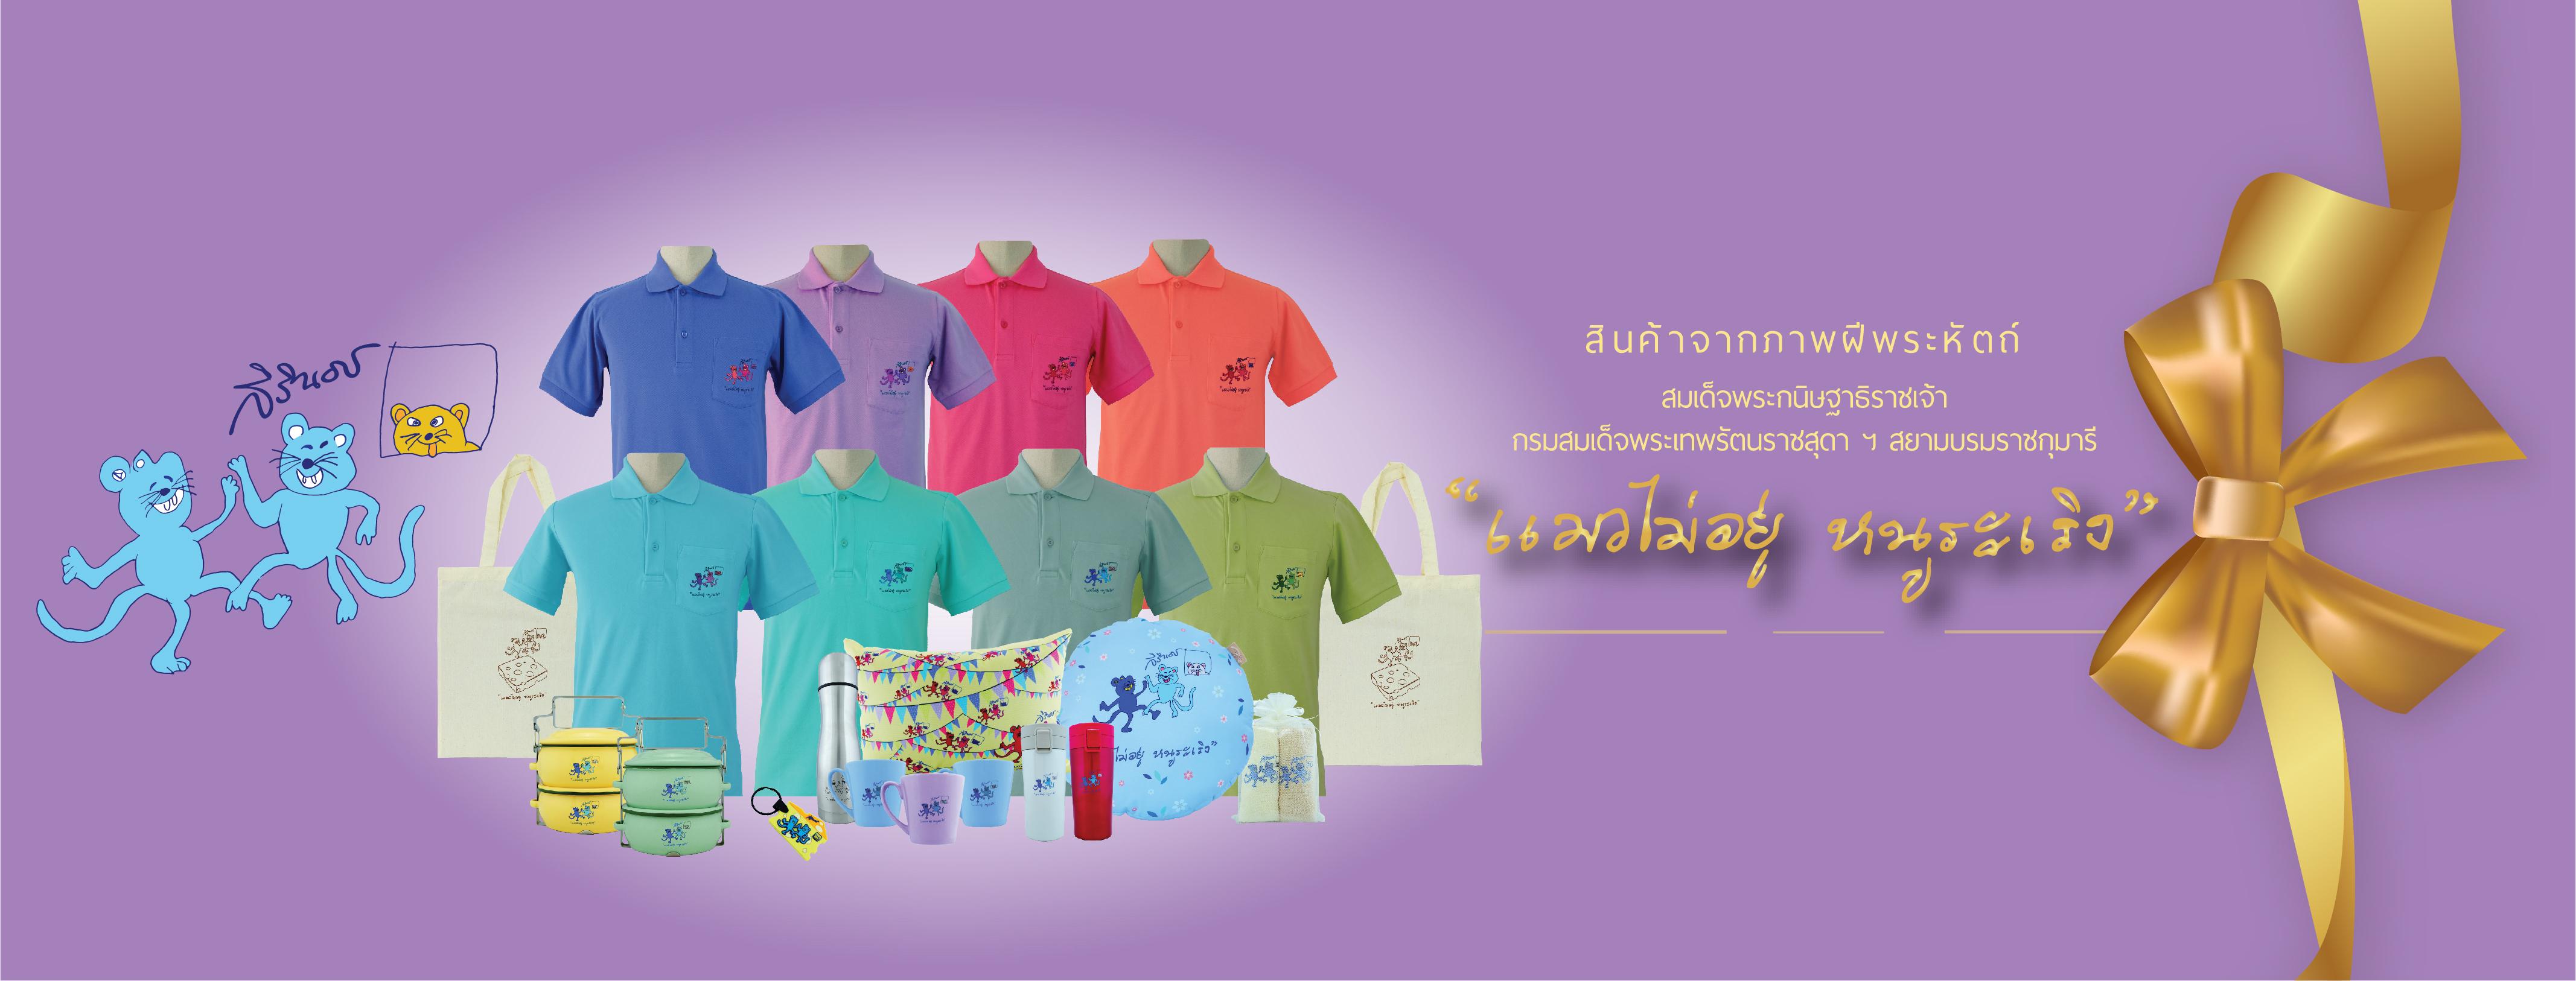 banneryearofrat_homepage02-01